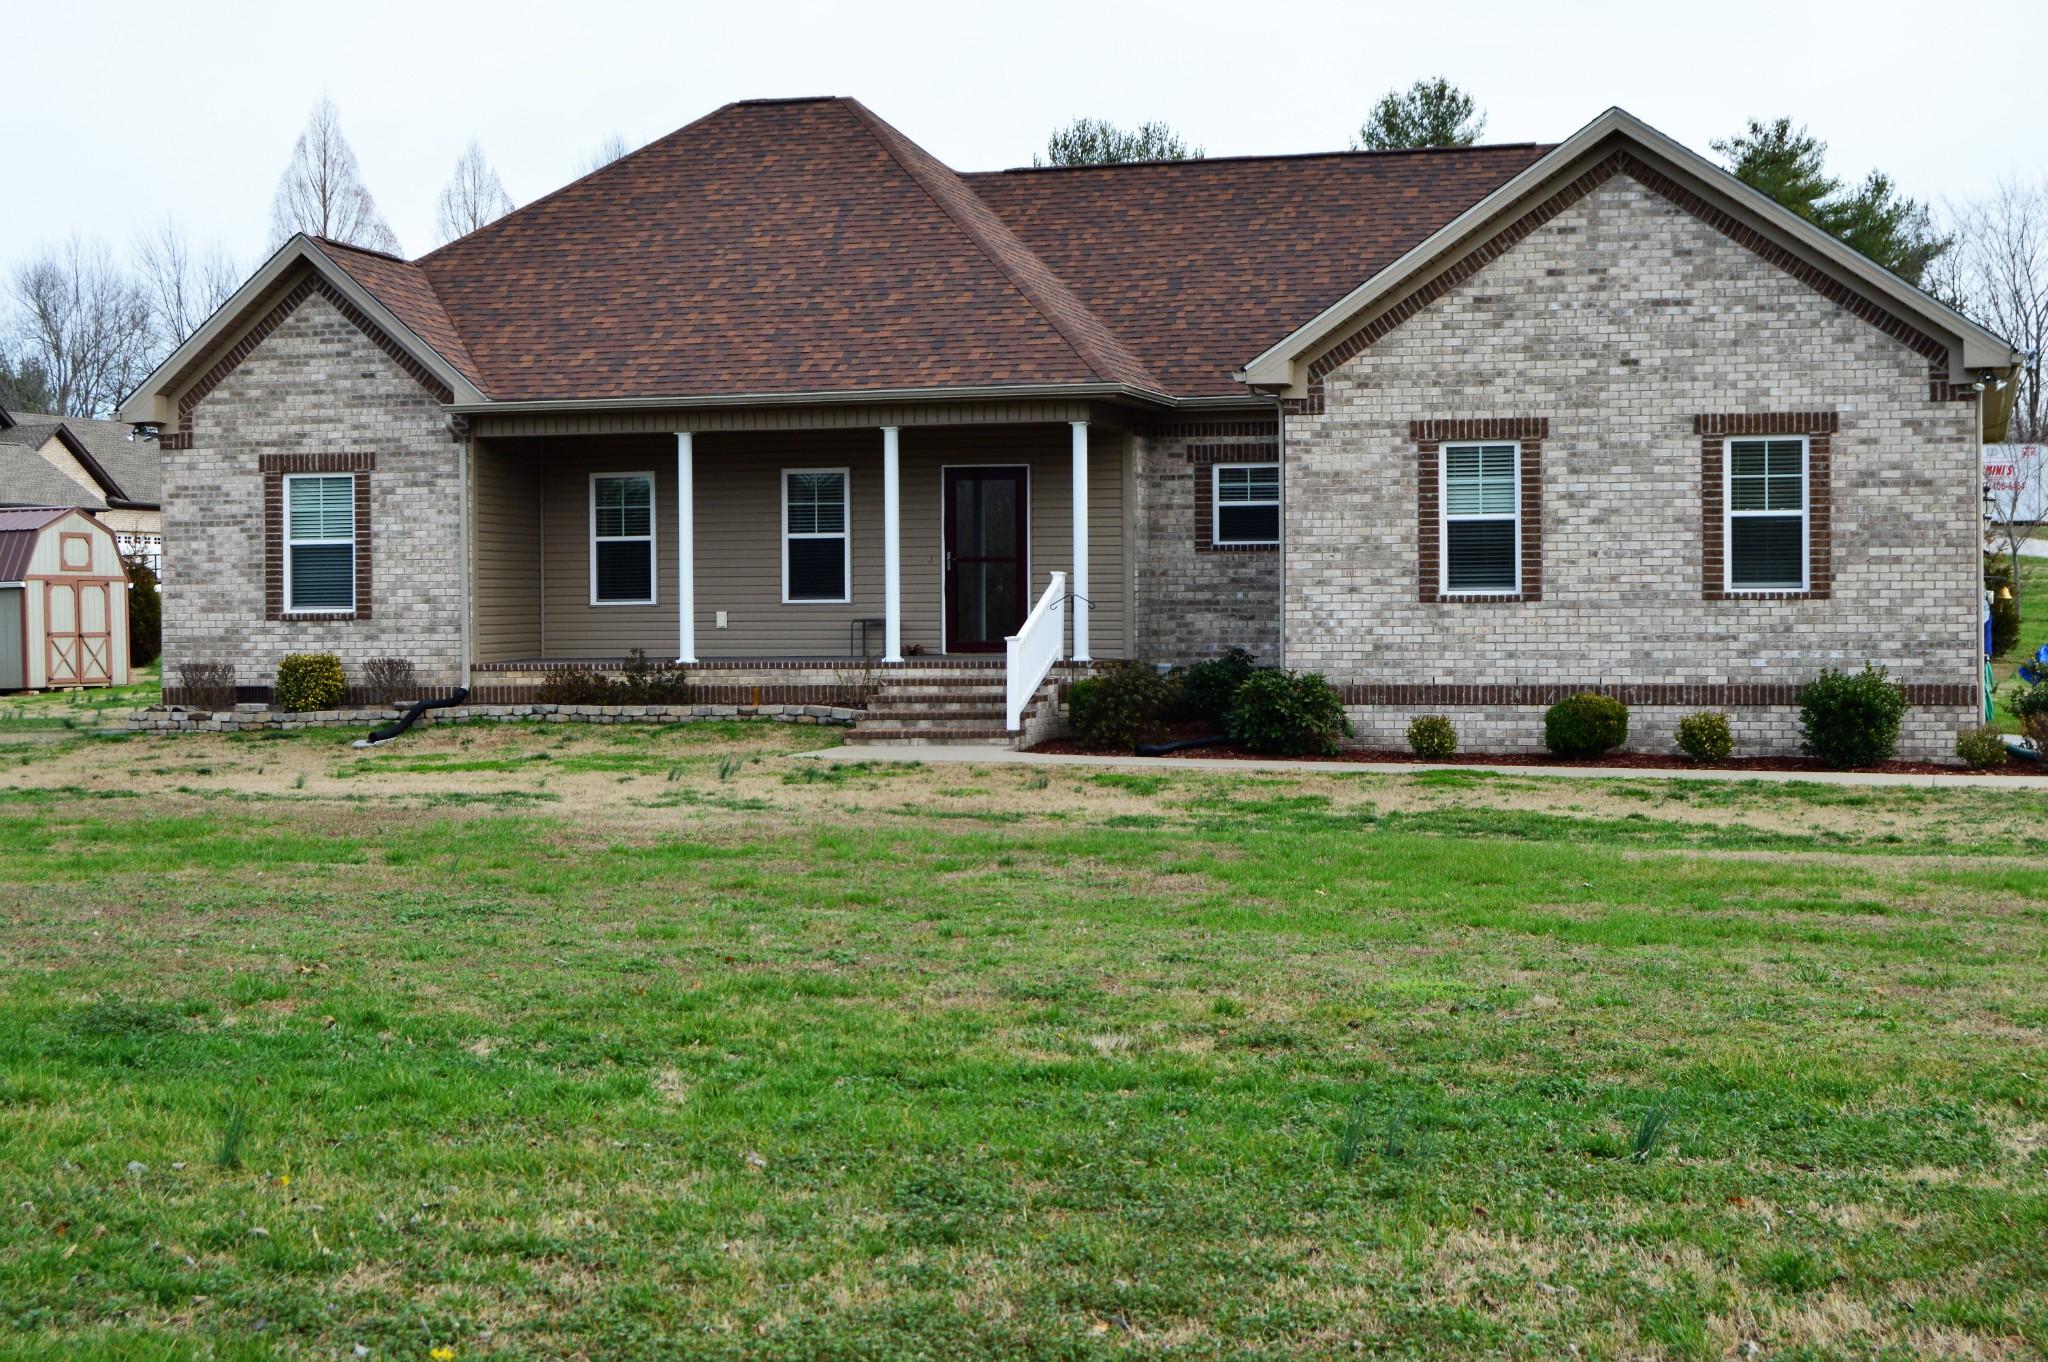 3662 Trousdale Ln, Columbia, TN 38401 - Columbia, TN real estate listing